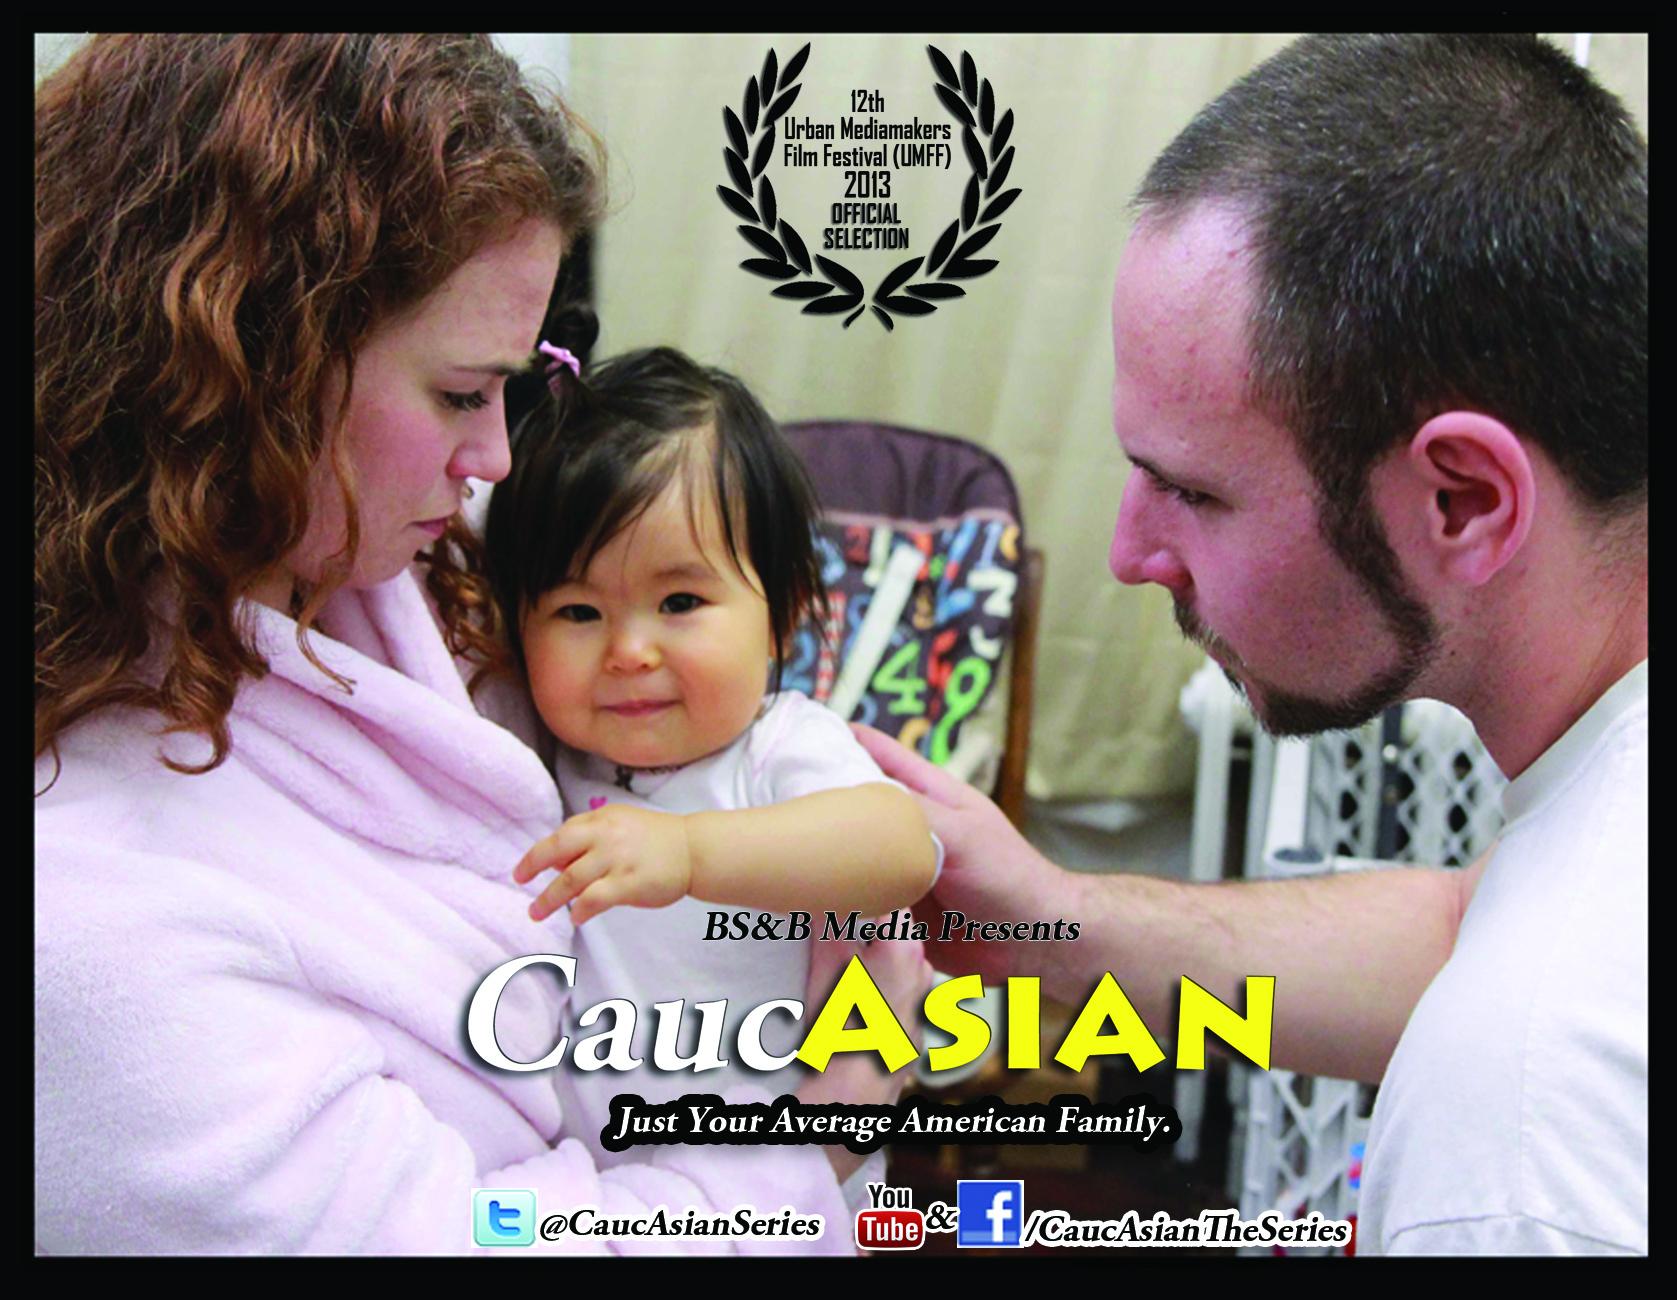 CaucAsian UMFF Postcard.jpg